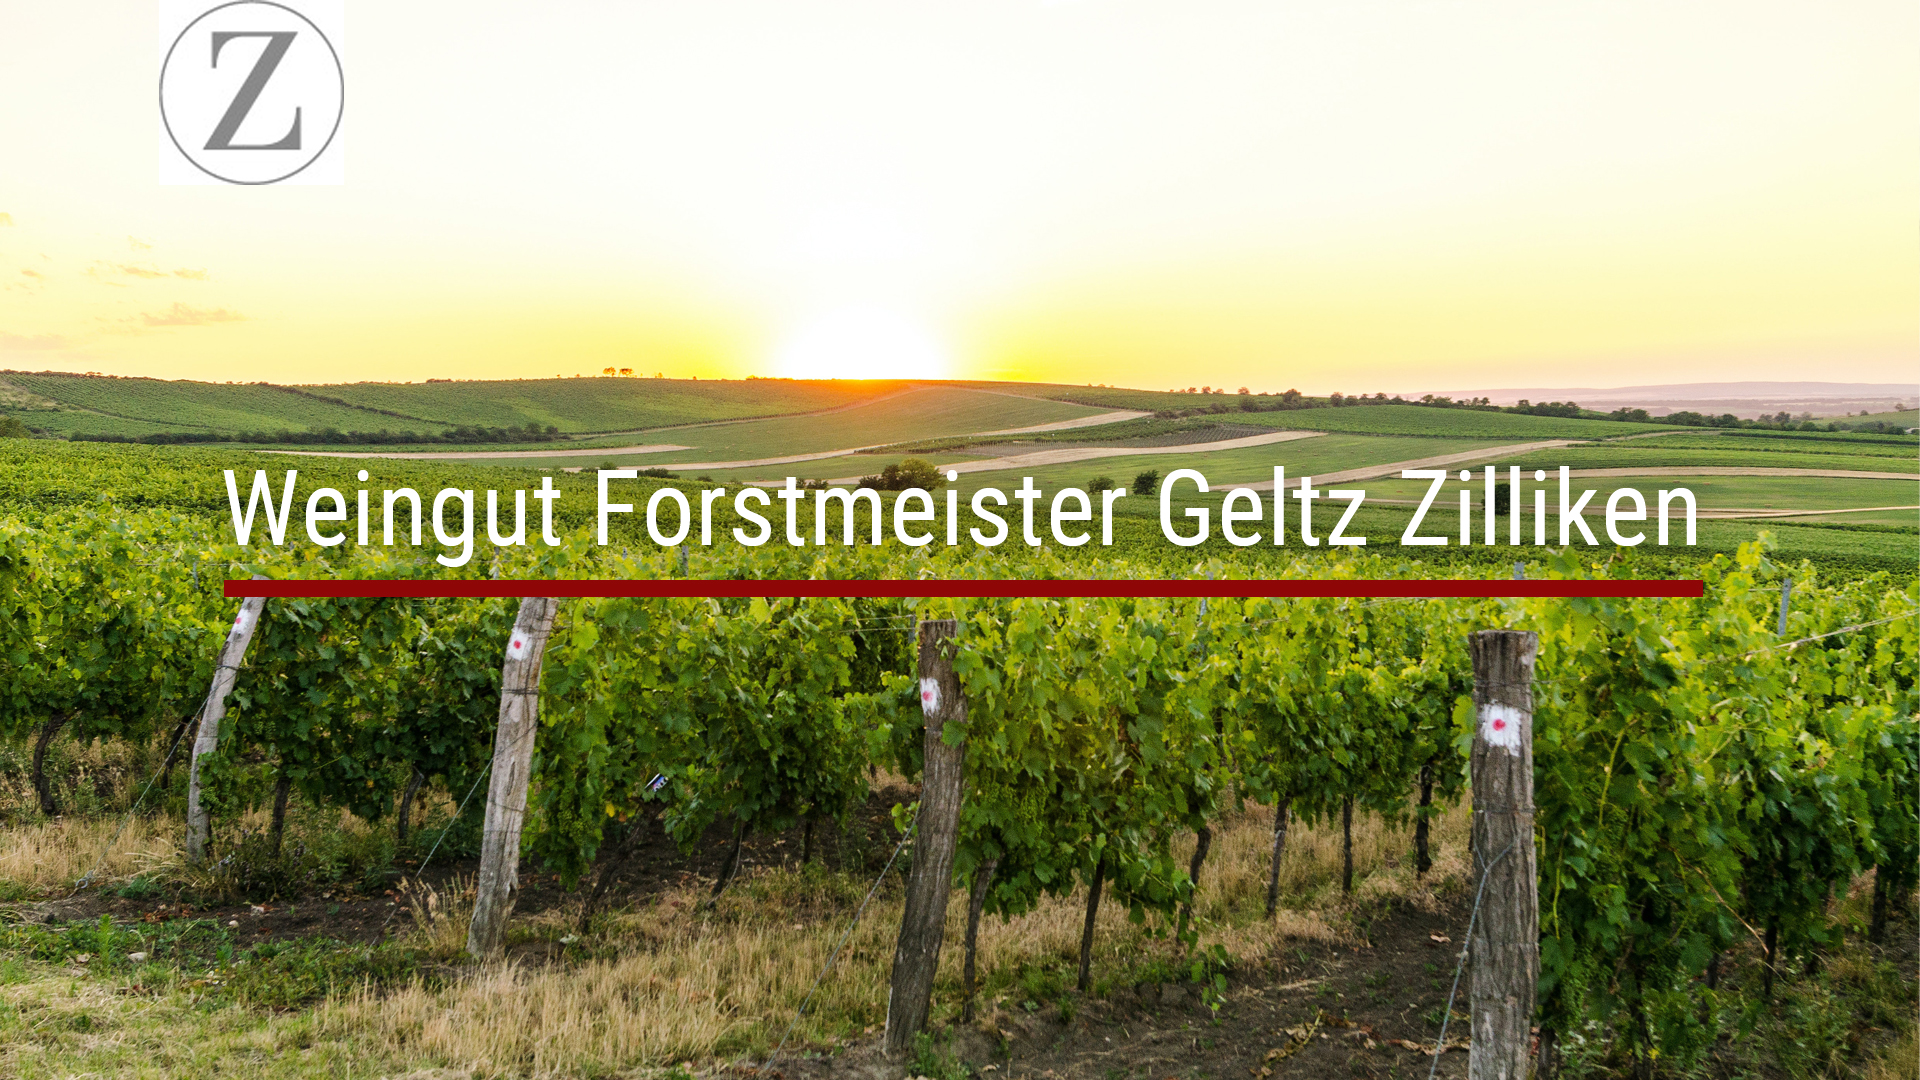 Dorothee Zilliken – Weingut Forstmeister Geltz Zilliken